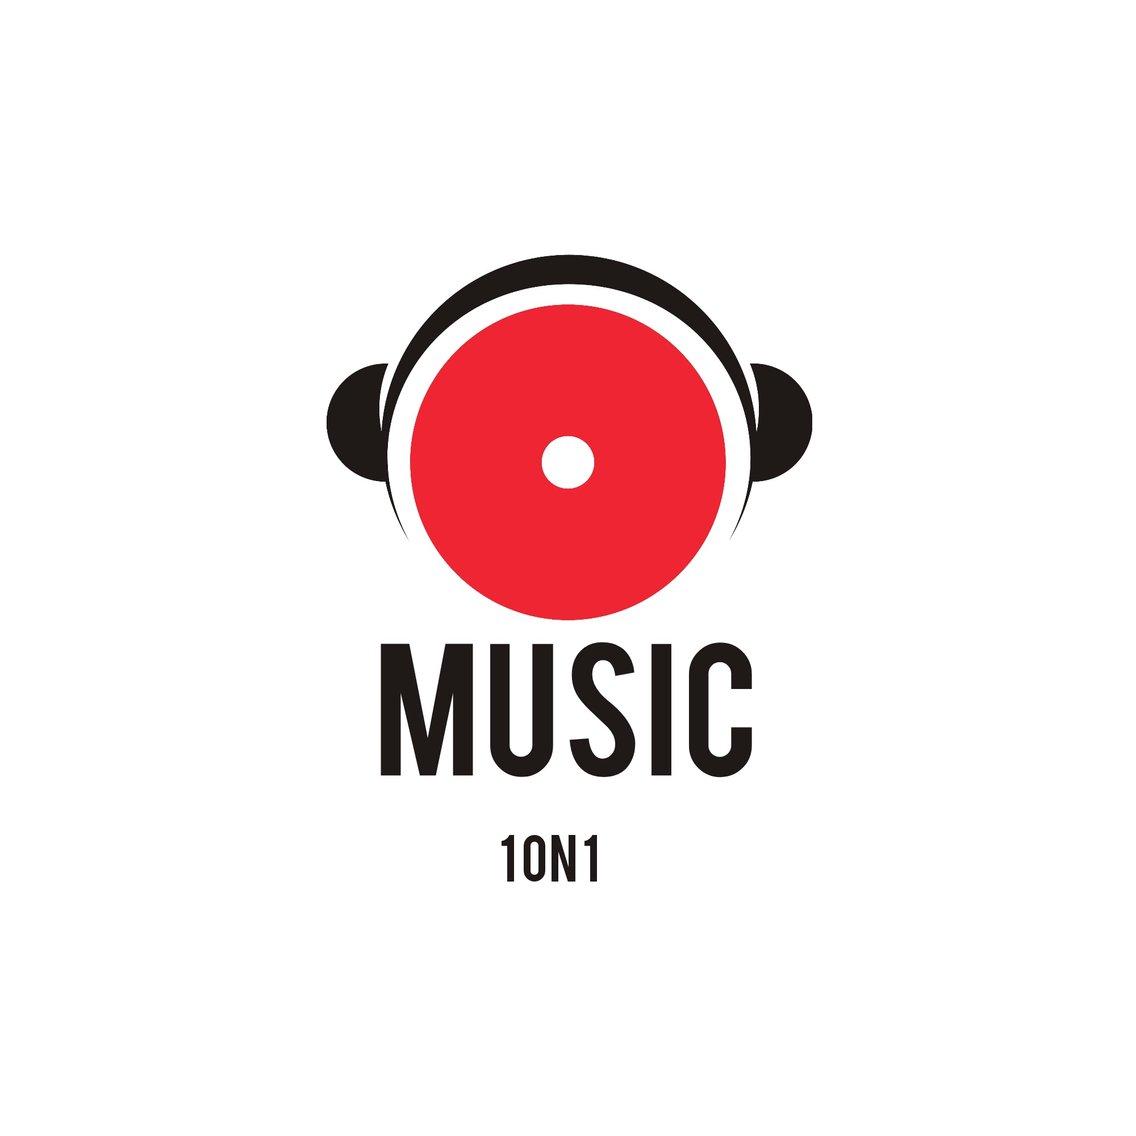 Music 1on1 - imagen de portada